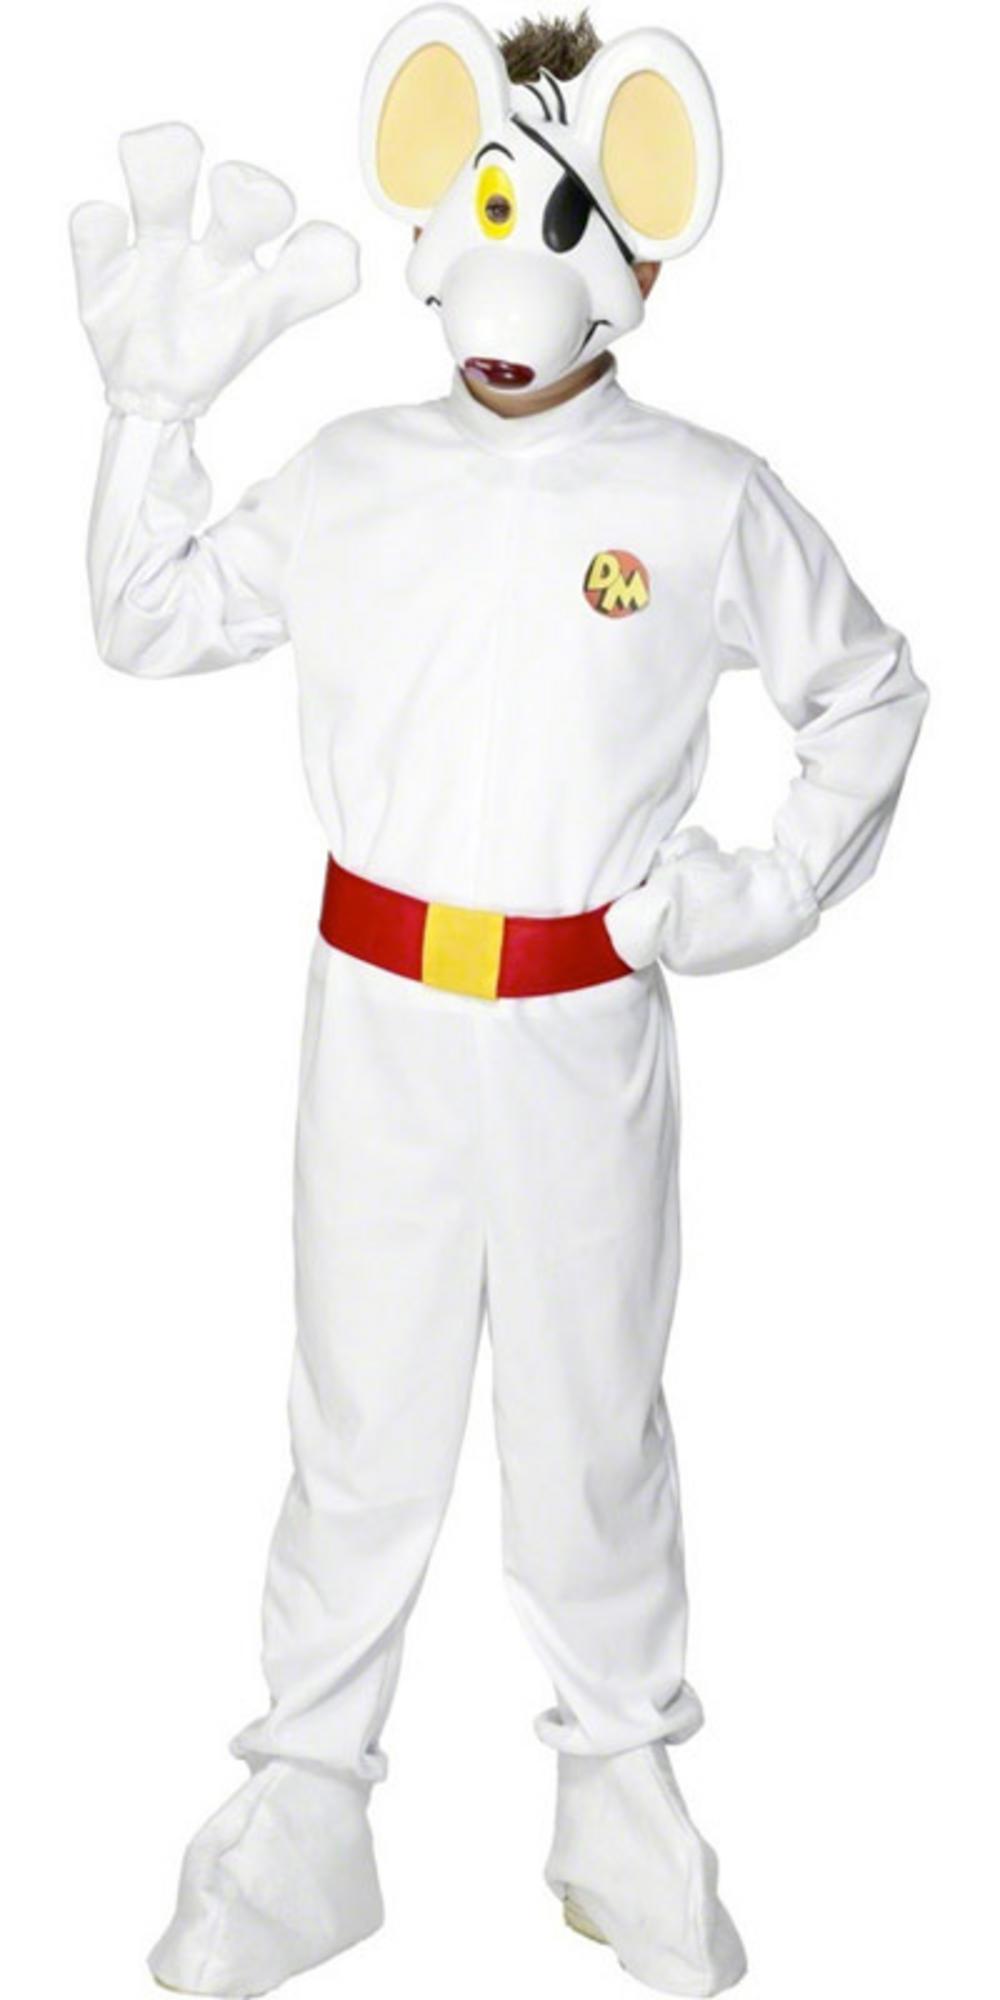 Cartoon Characters Outfits : Childs danger mouse fancy dress halloween s cartoon tv